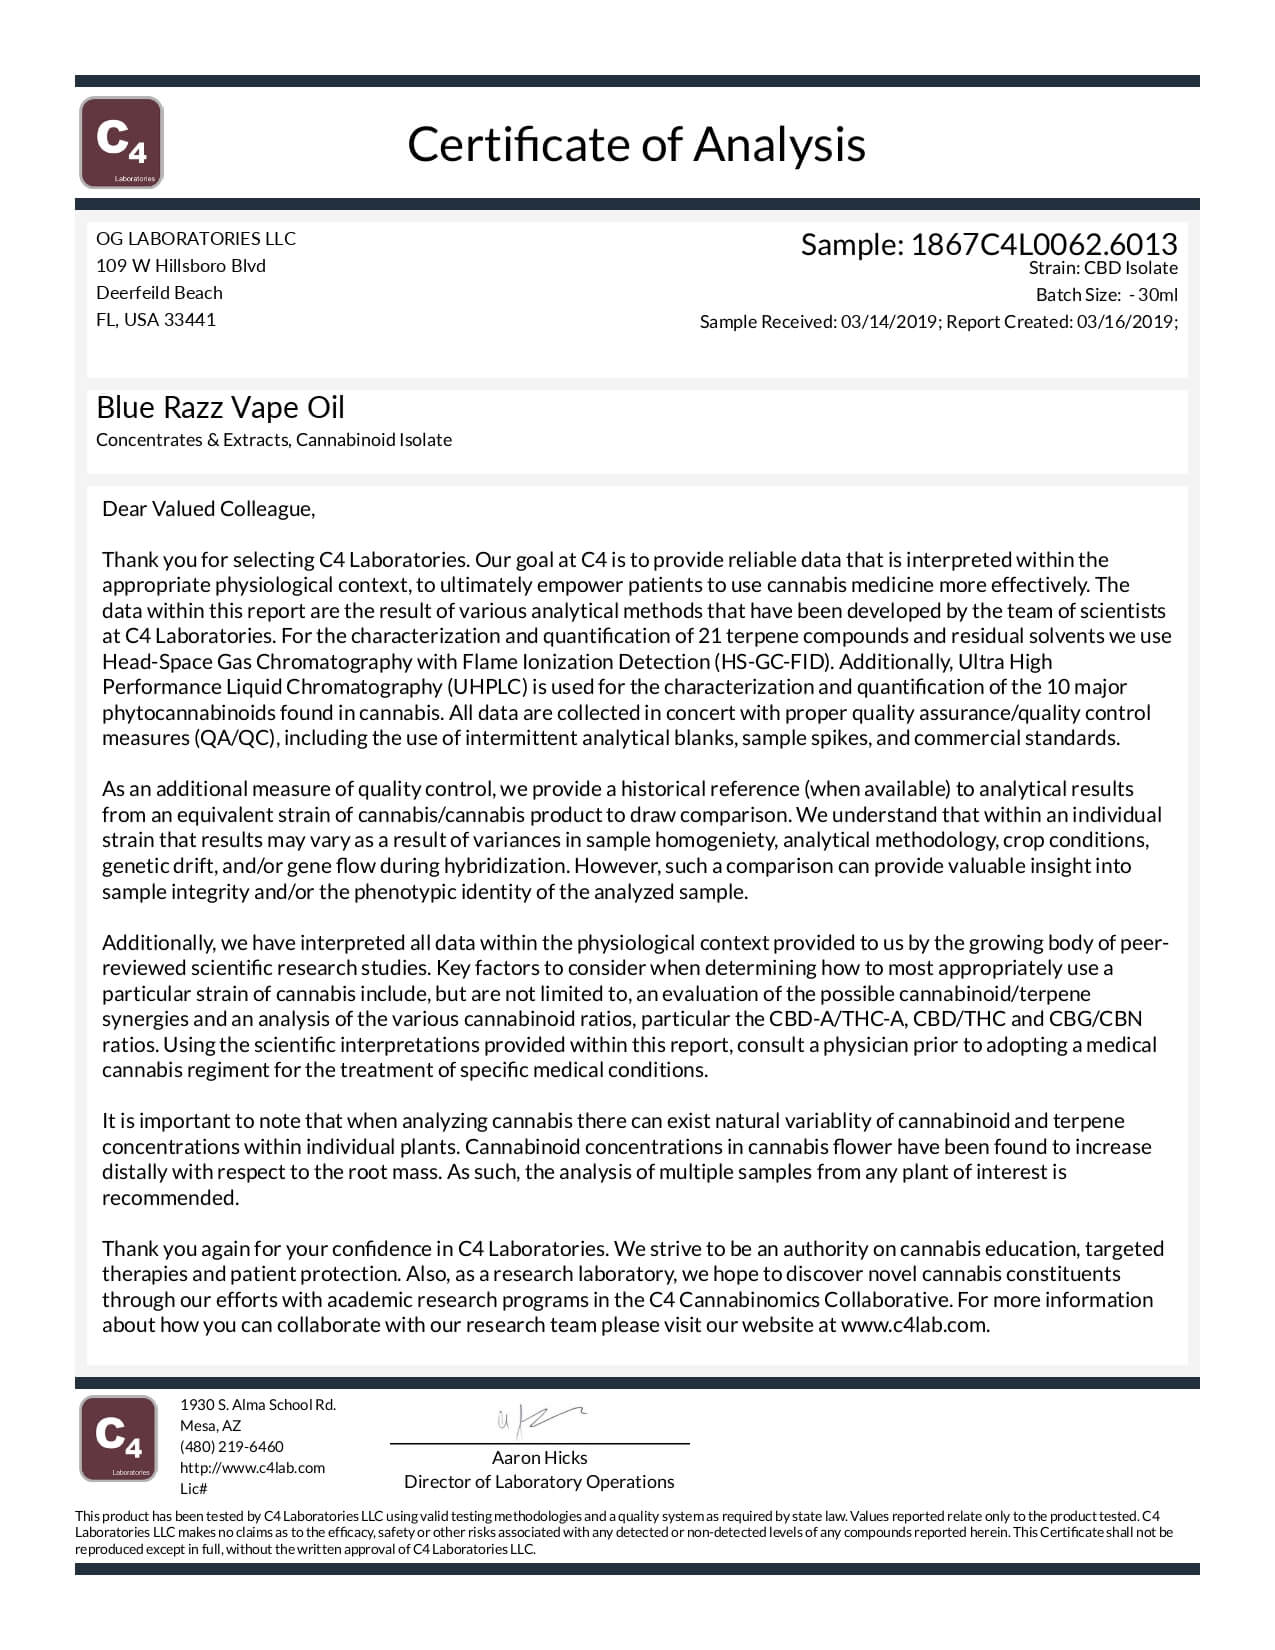 OG Labs CBD Vape Juice Blue Razz 125mg Lab Report